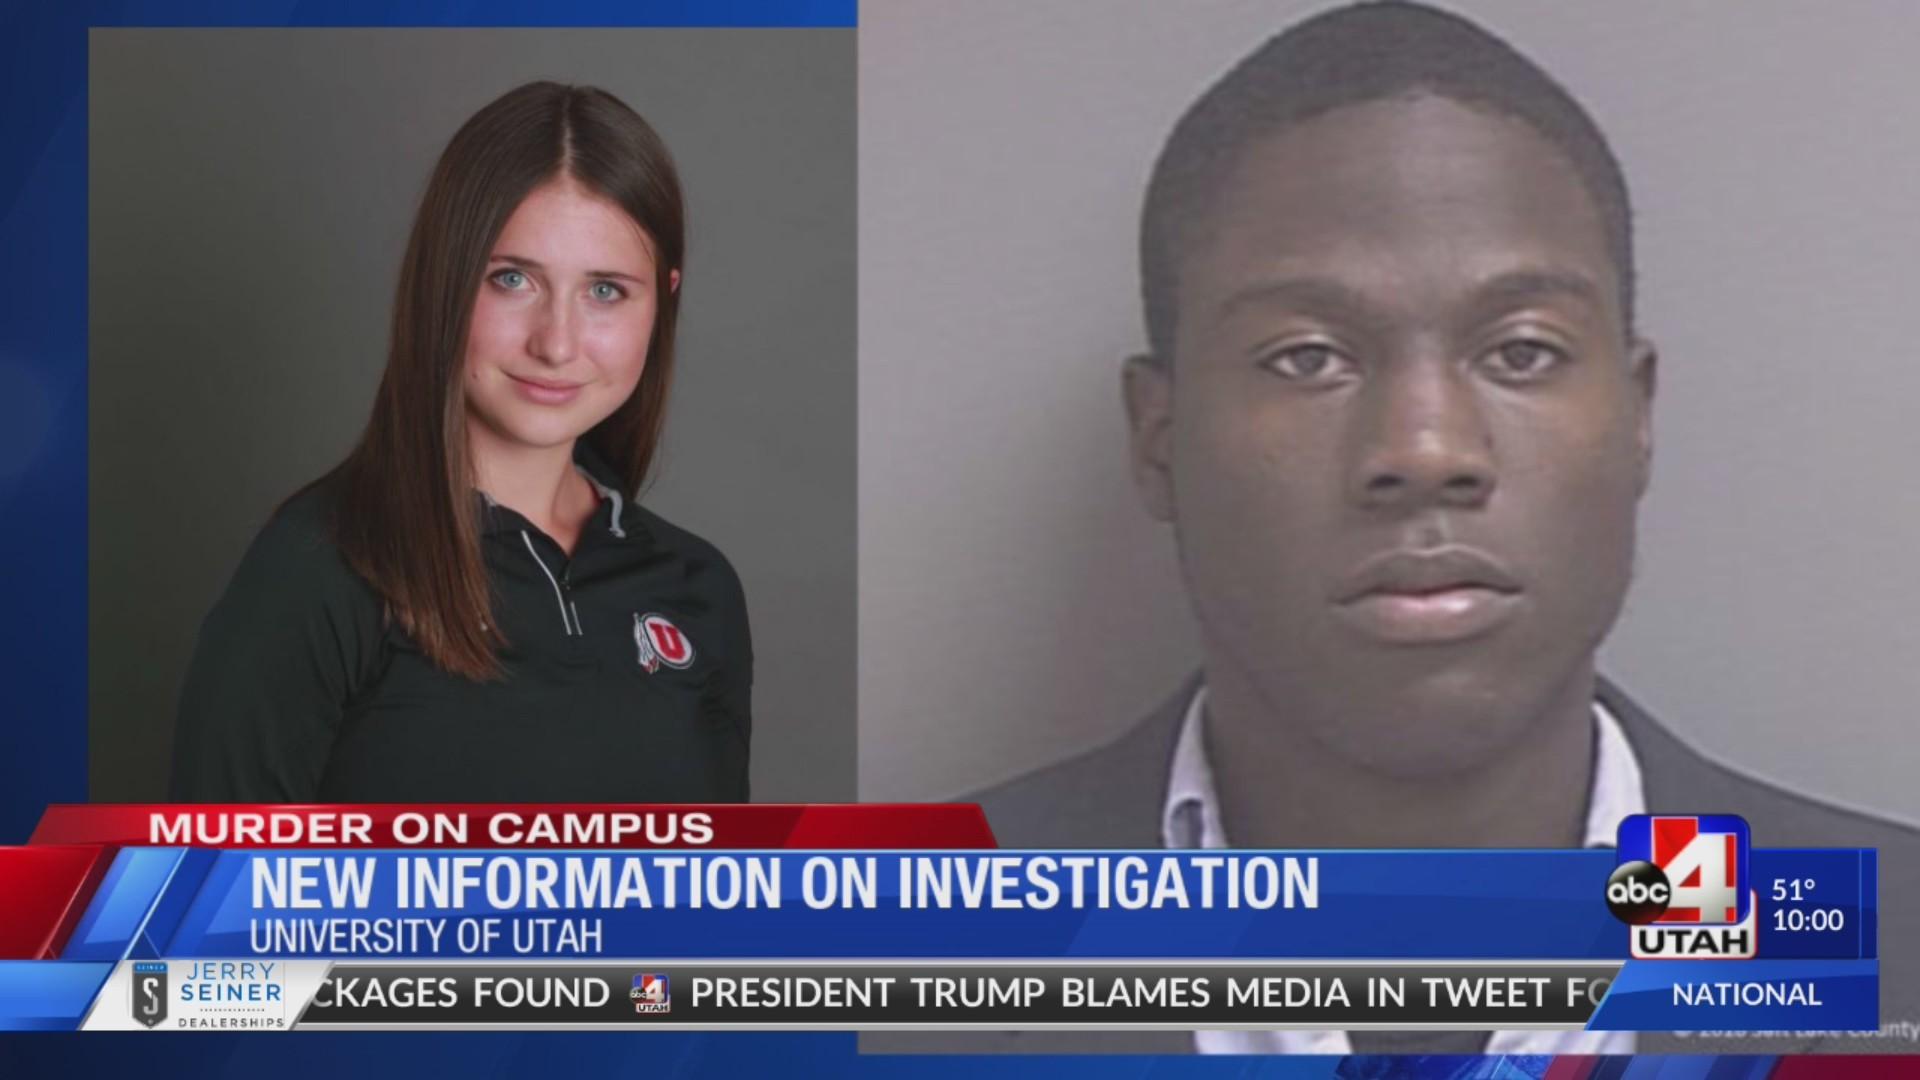 Timeline of days before U of U student's murder reveals